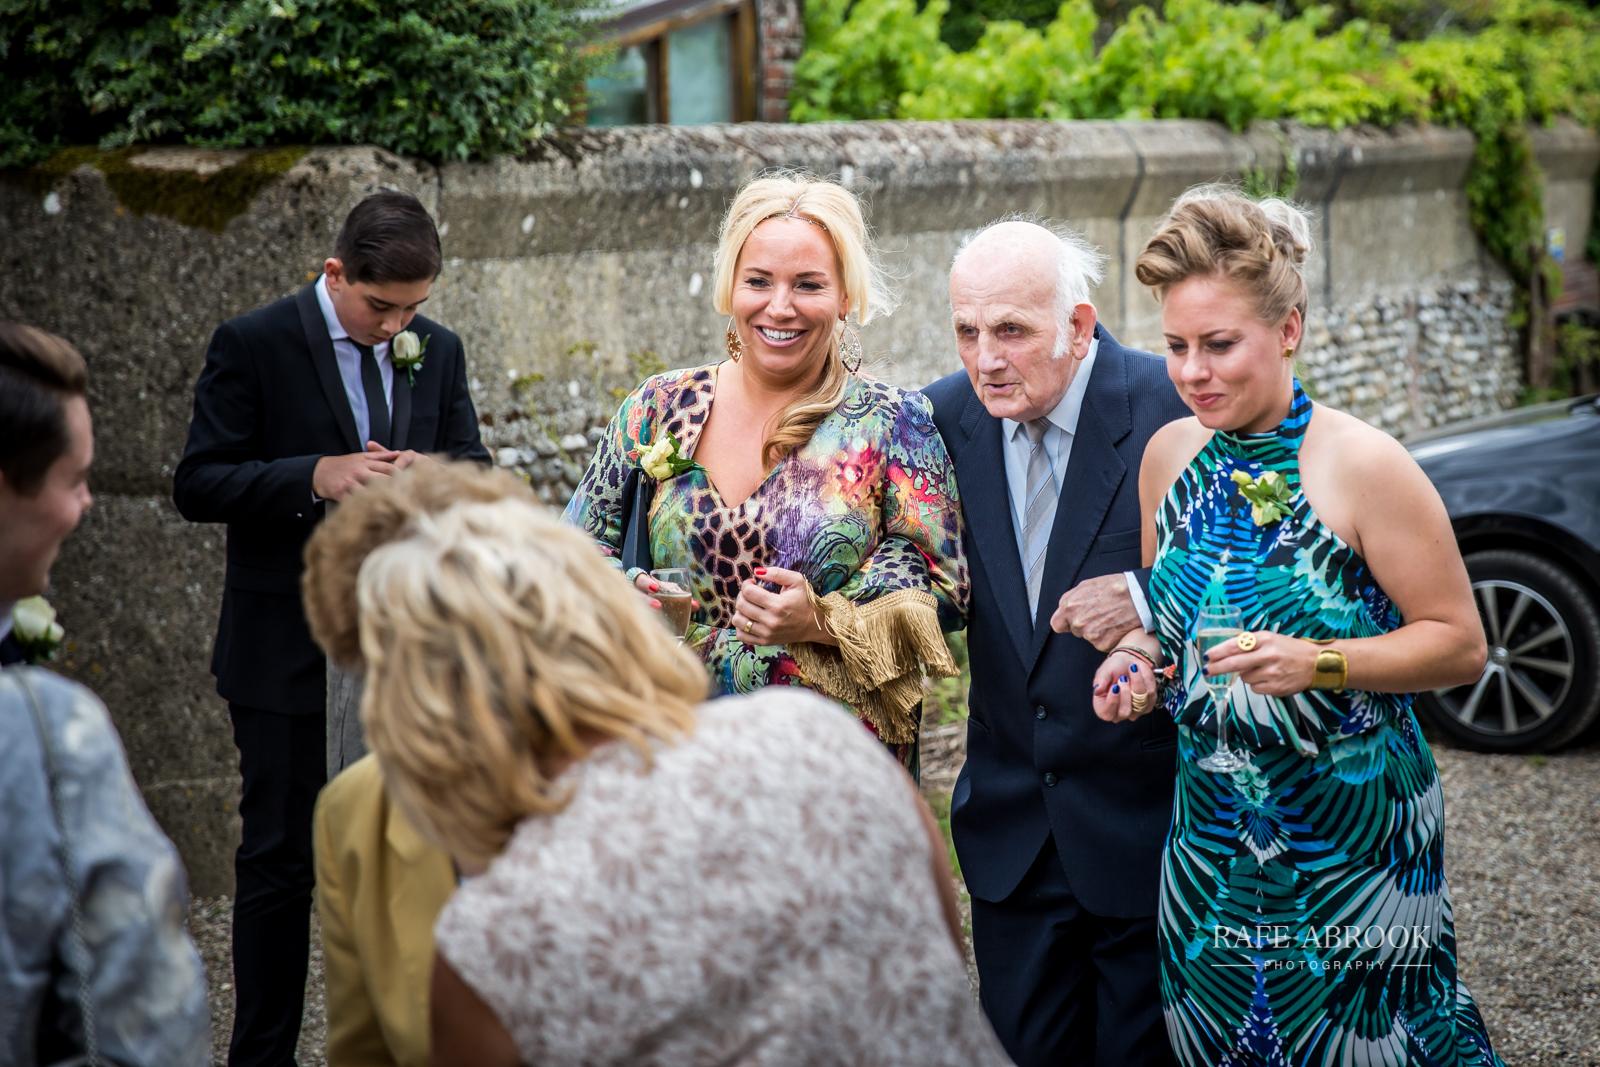 cley windmill wedding norfolk hertfordshire wedding photographer-1089.jpg